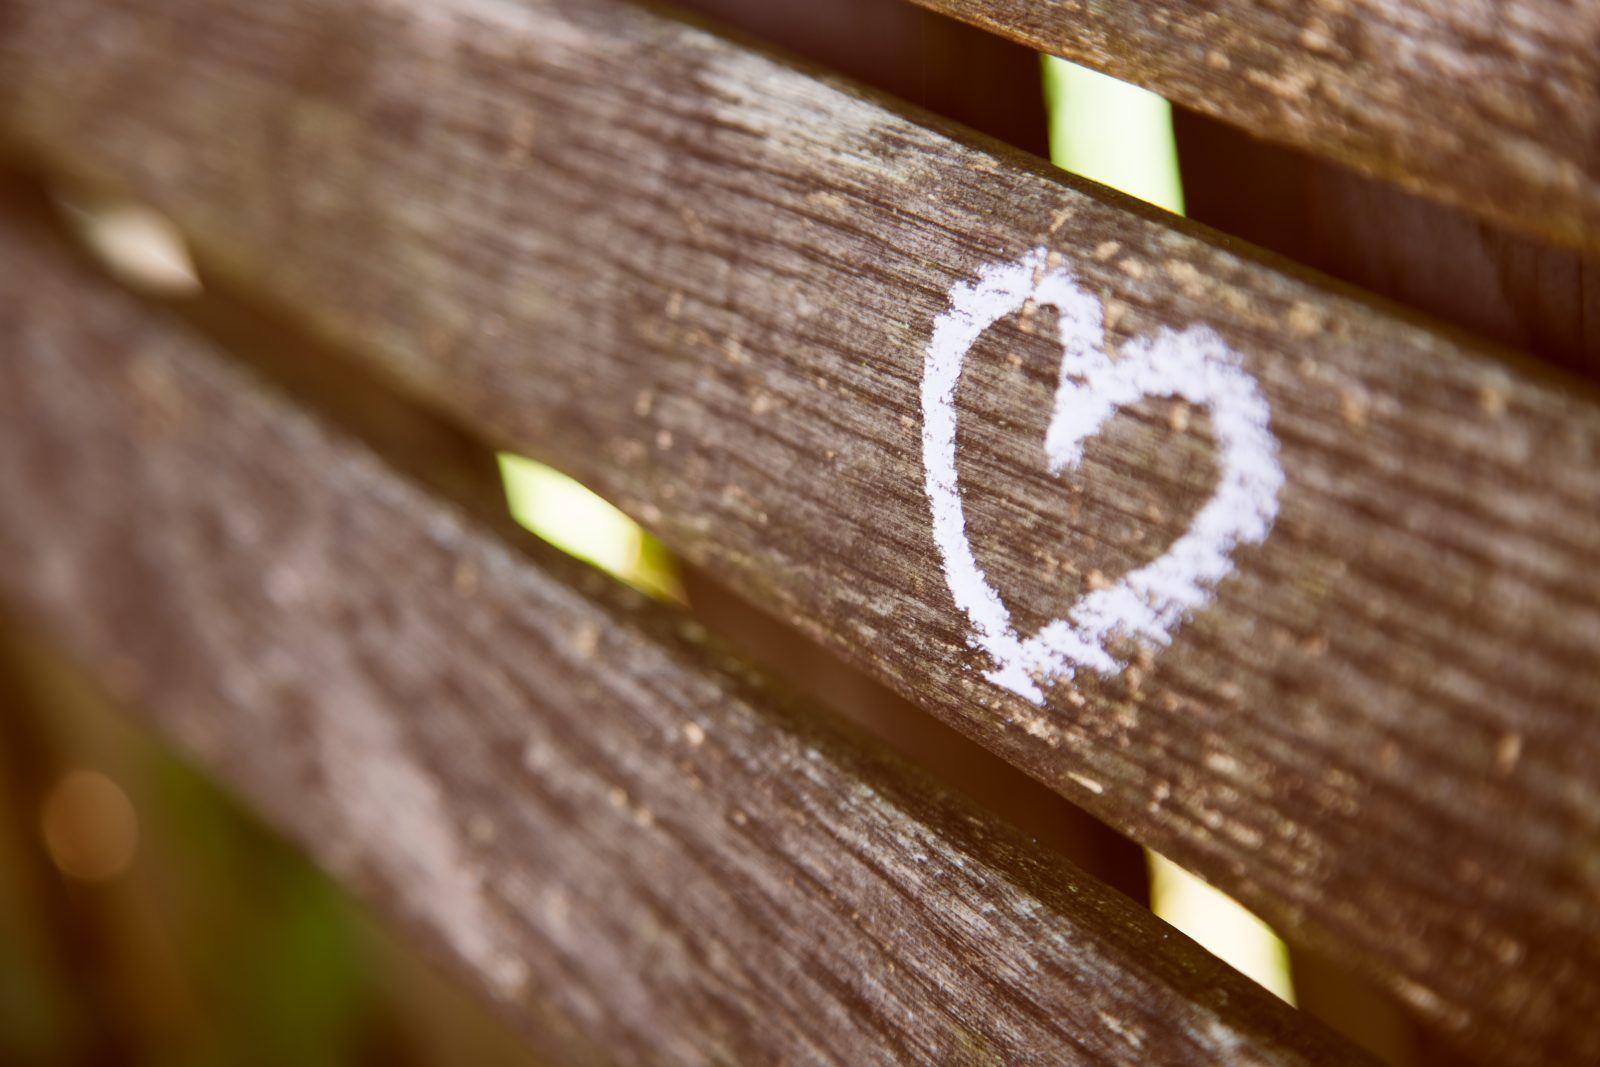 How to practice self-love?